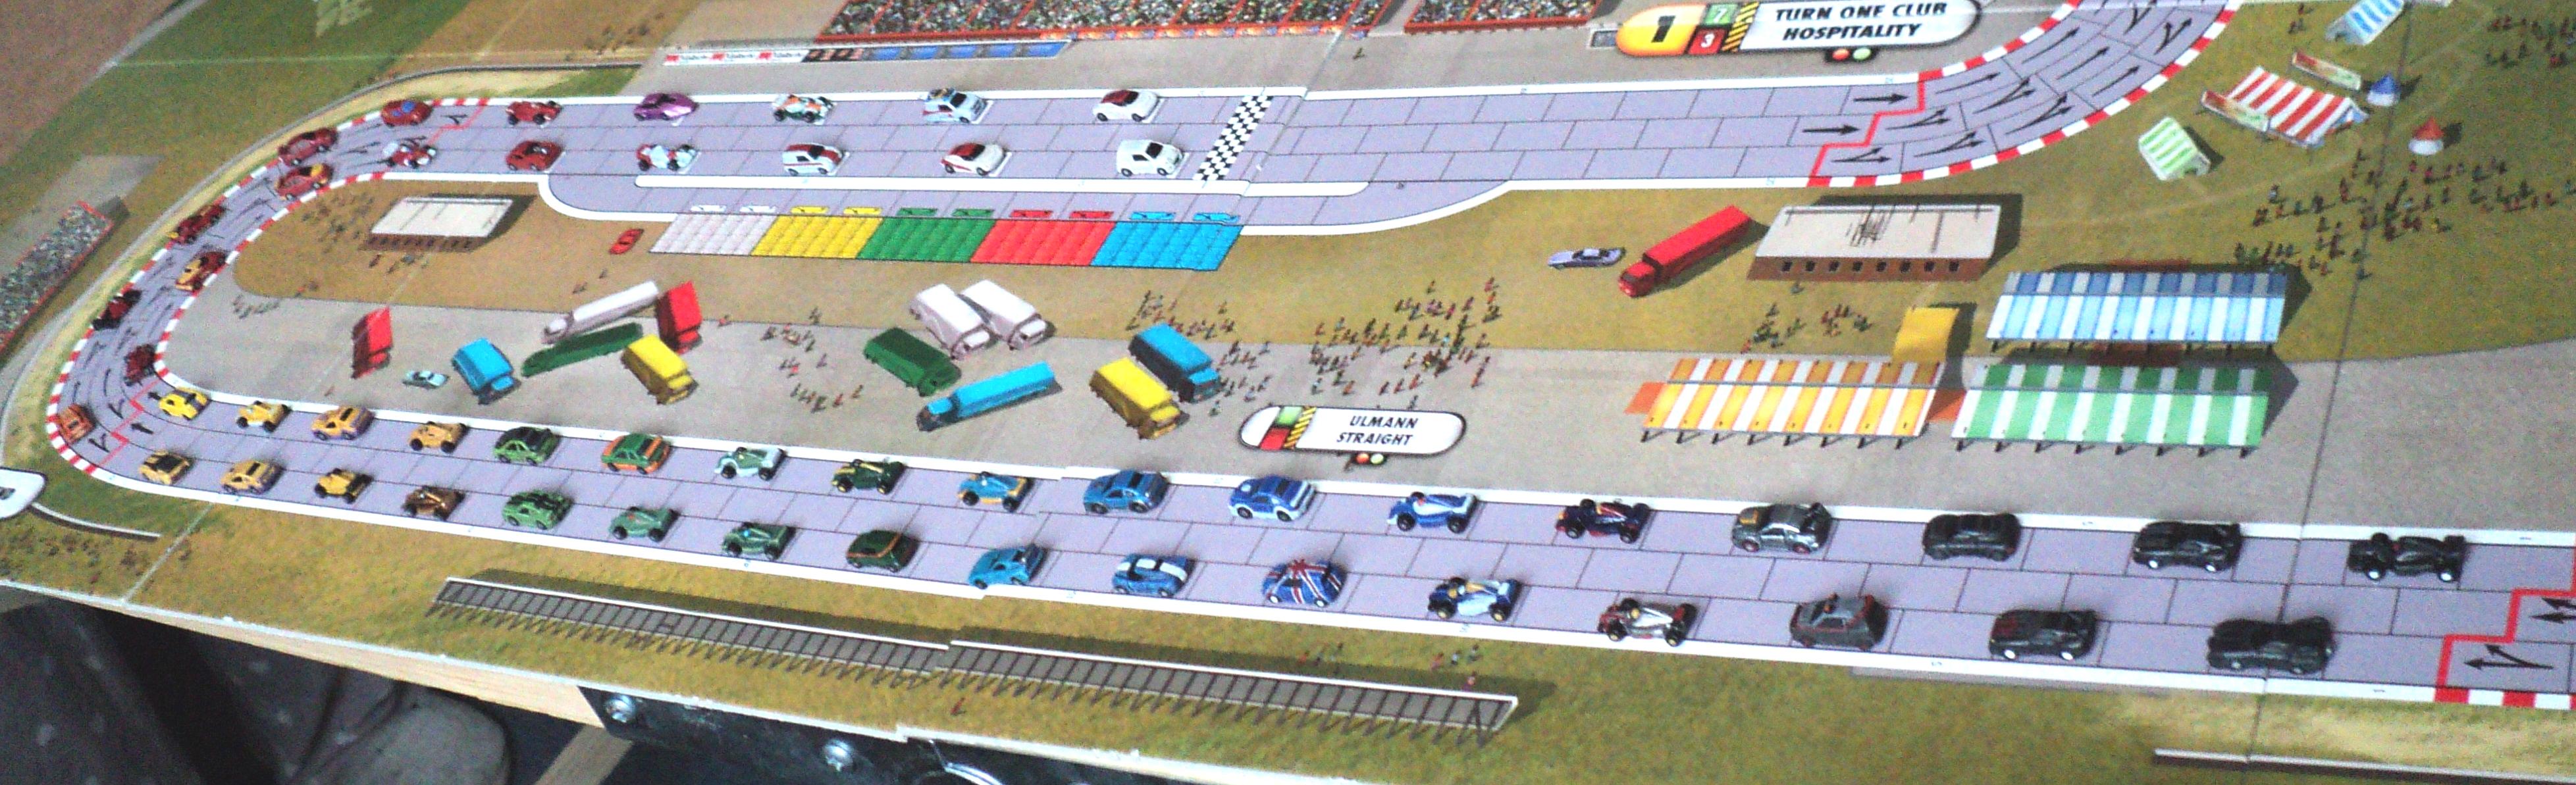 Cars  Board Games